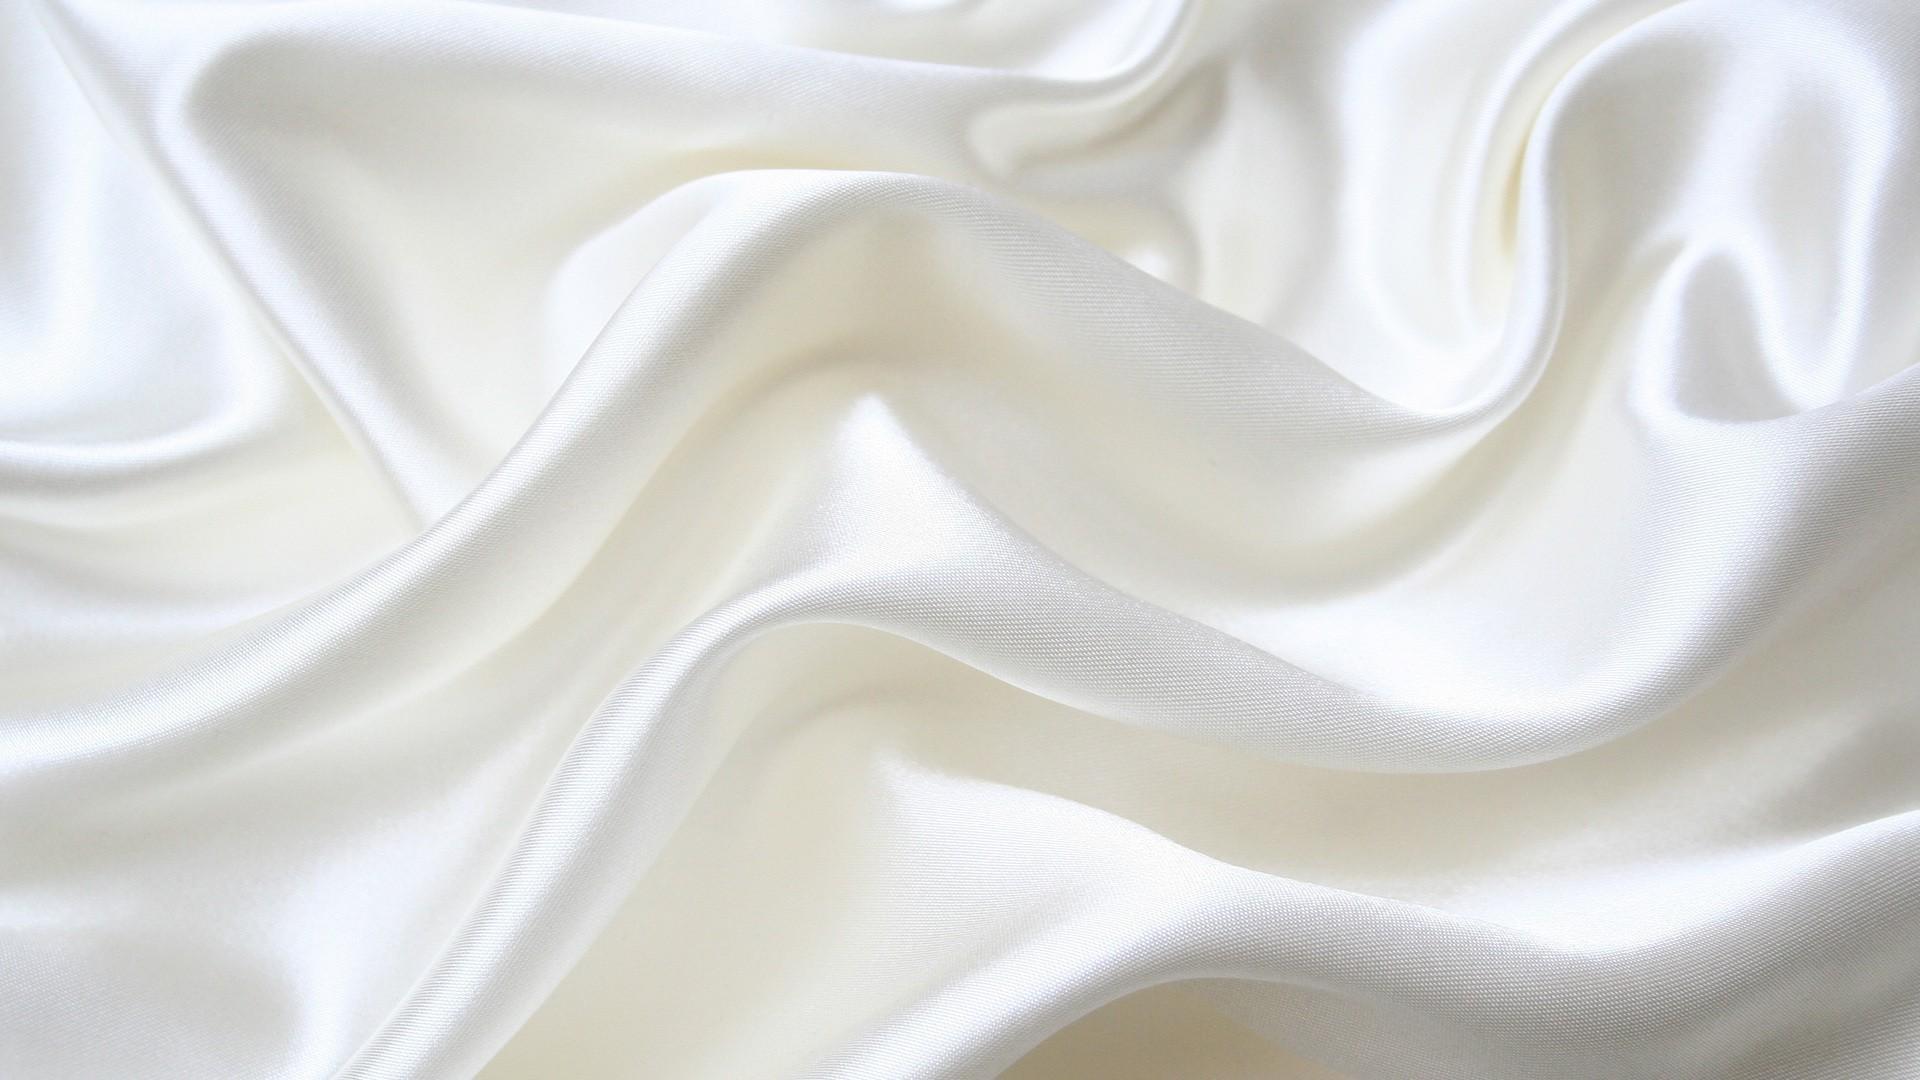 Abstract textures silk wallpaper